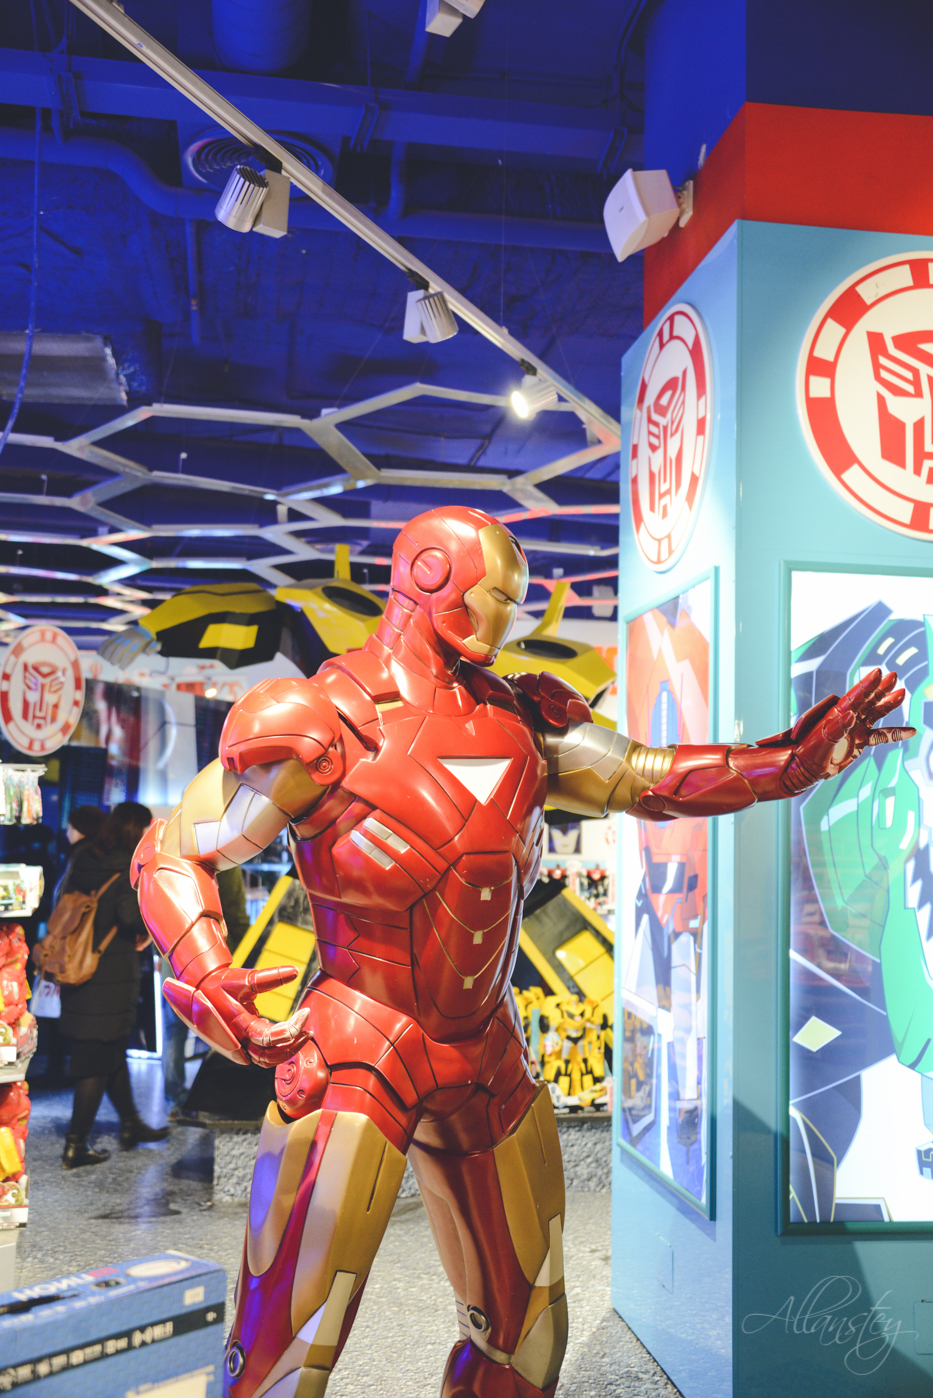 Ironman in Detsky Mir shop